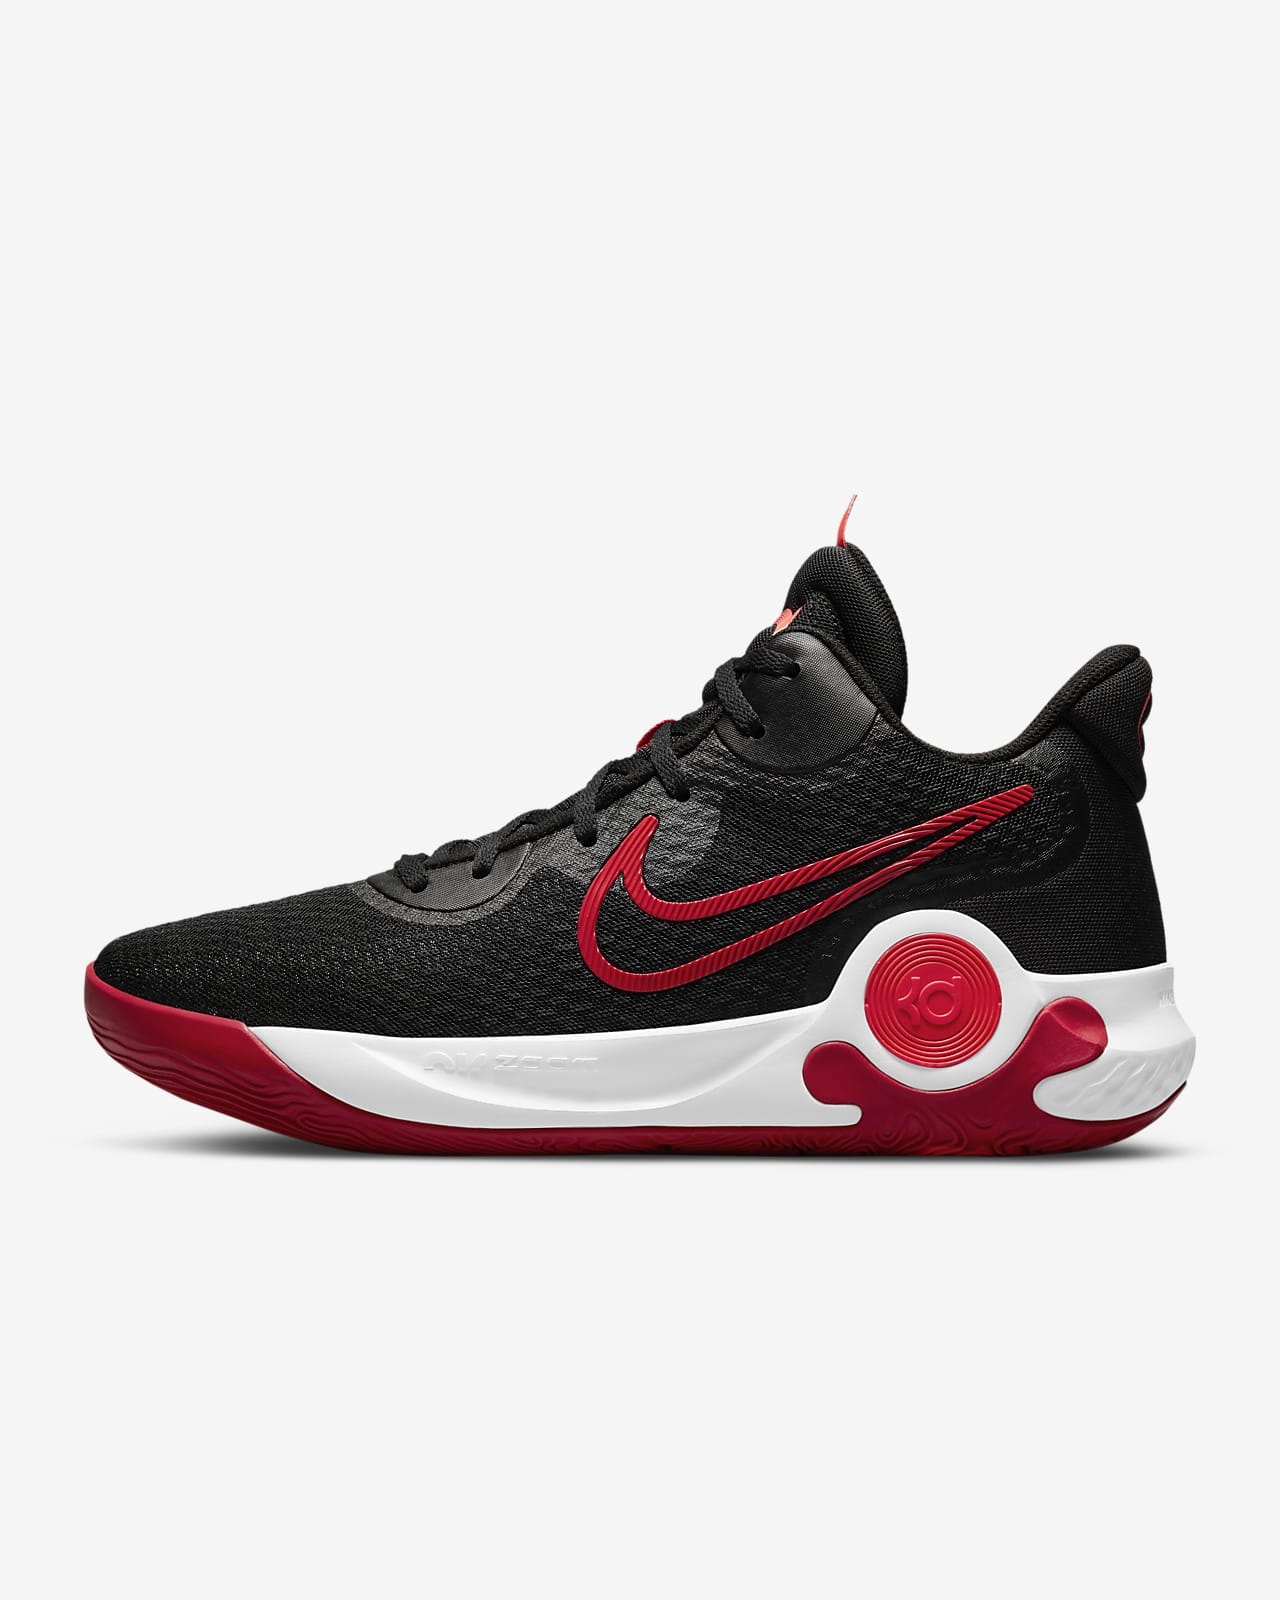 KD Trey 5 IX EP Basketball Shoe